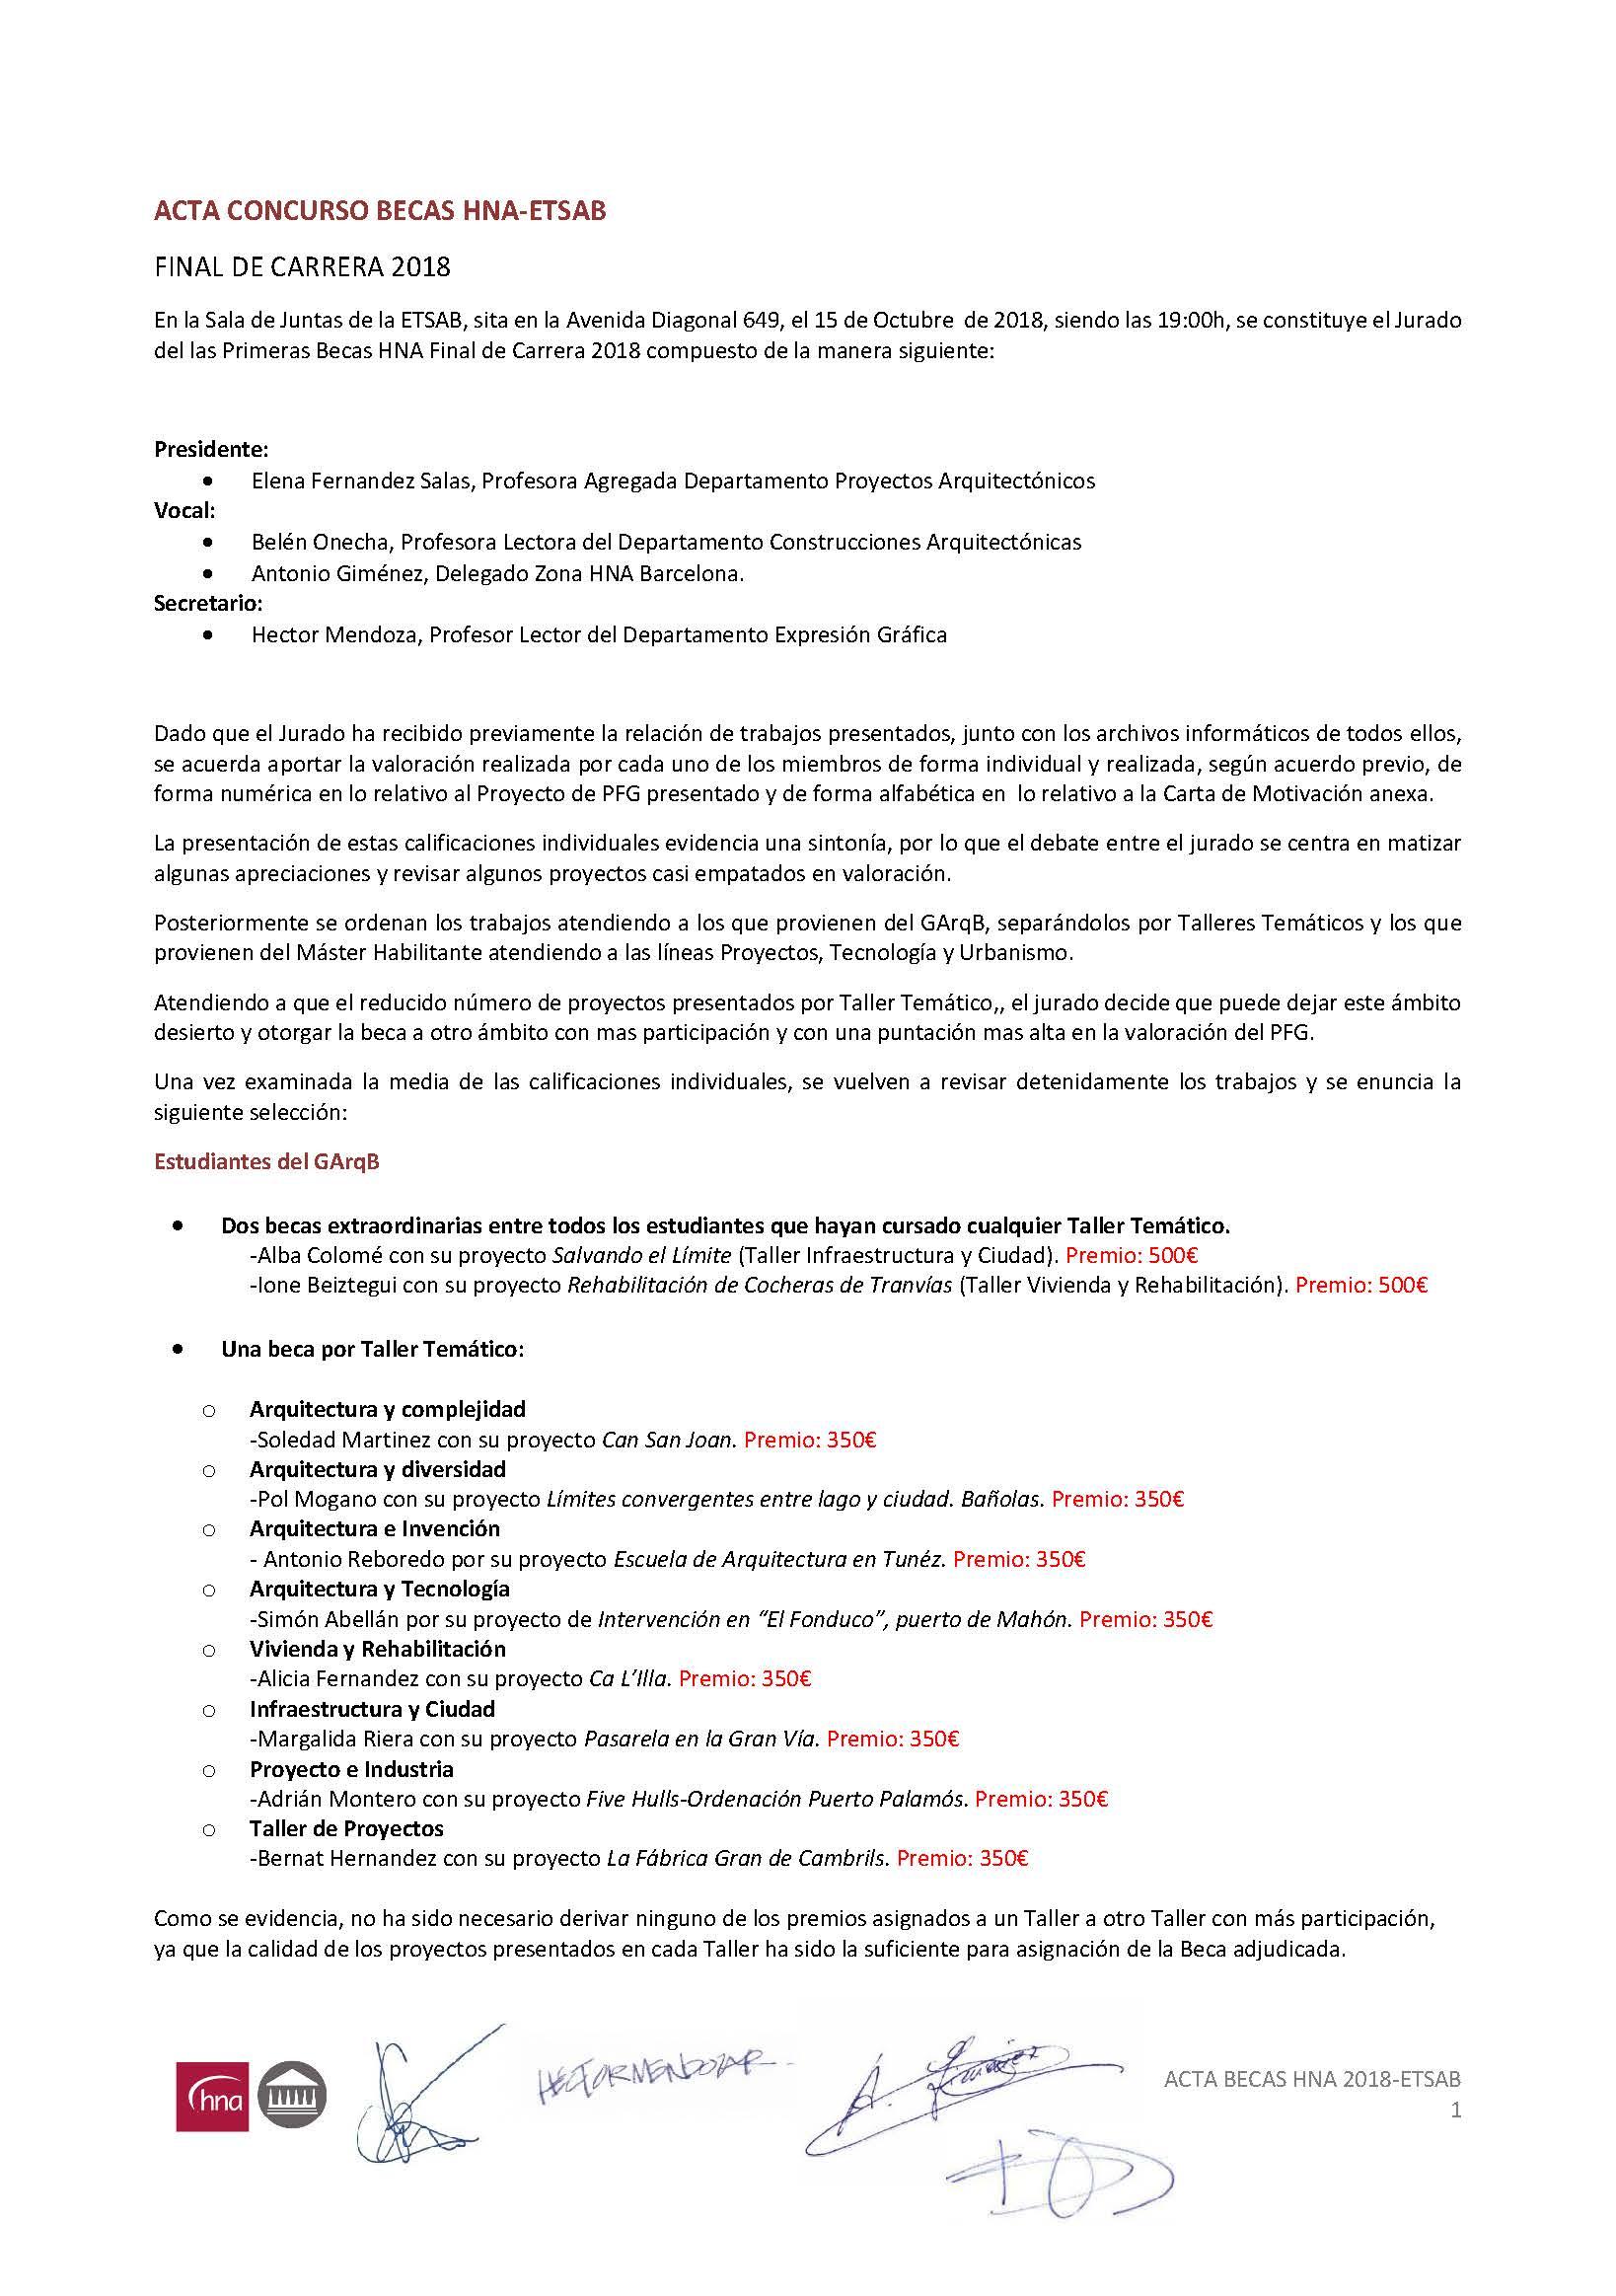 ACTA CONCURS HNA 2018-1.jpg